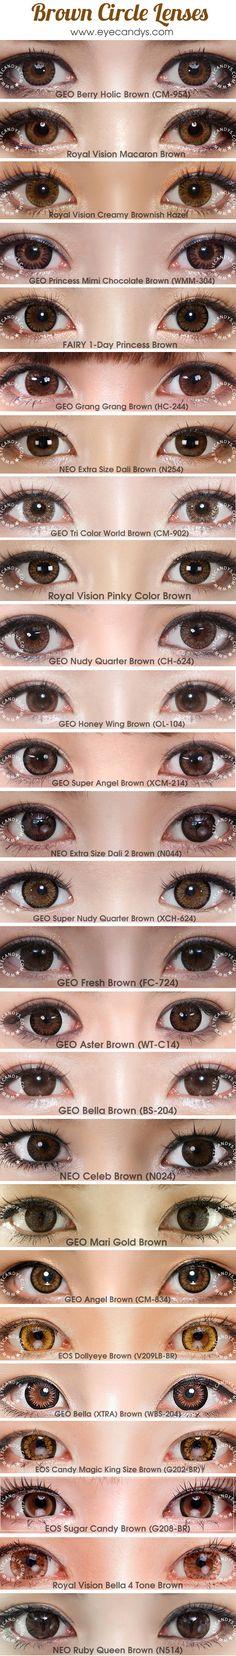 New hair color korean circle lenses Ideas - Modern Cosmetic Contact Lenses, Eye Contact Lenses, Coloured Contact Lenses, Makeup Black, Hair Color Asian, Ulzzang Makeup, Asian Eye Makeup, Asian Eyes, Circle Lenses